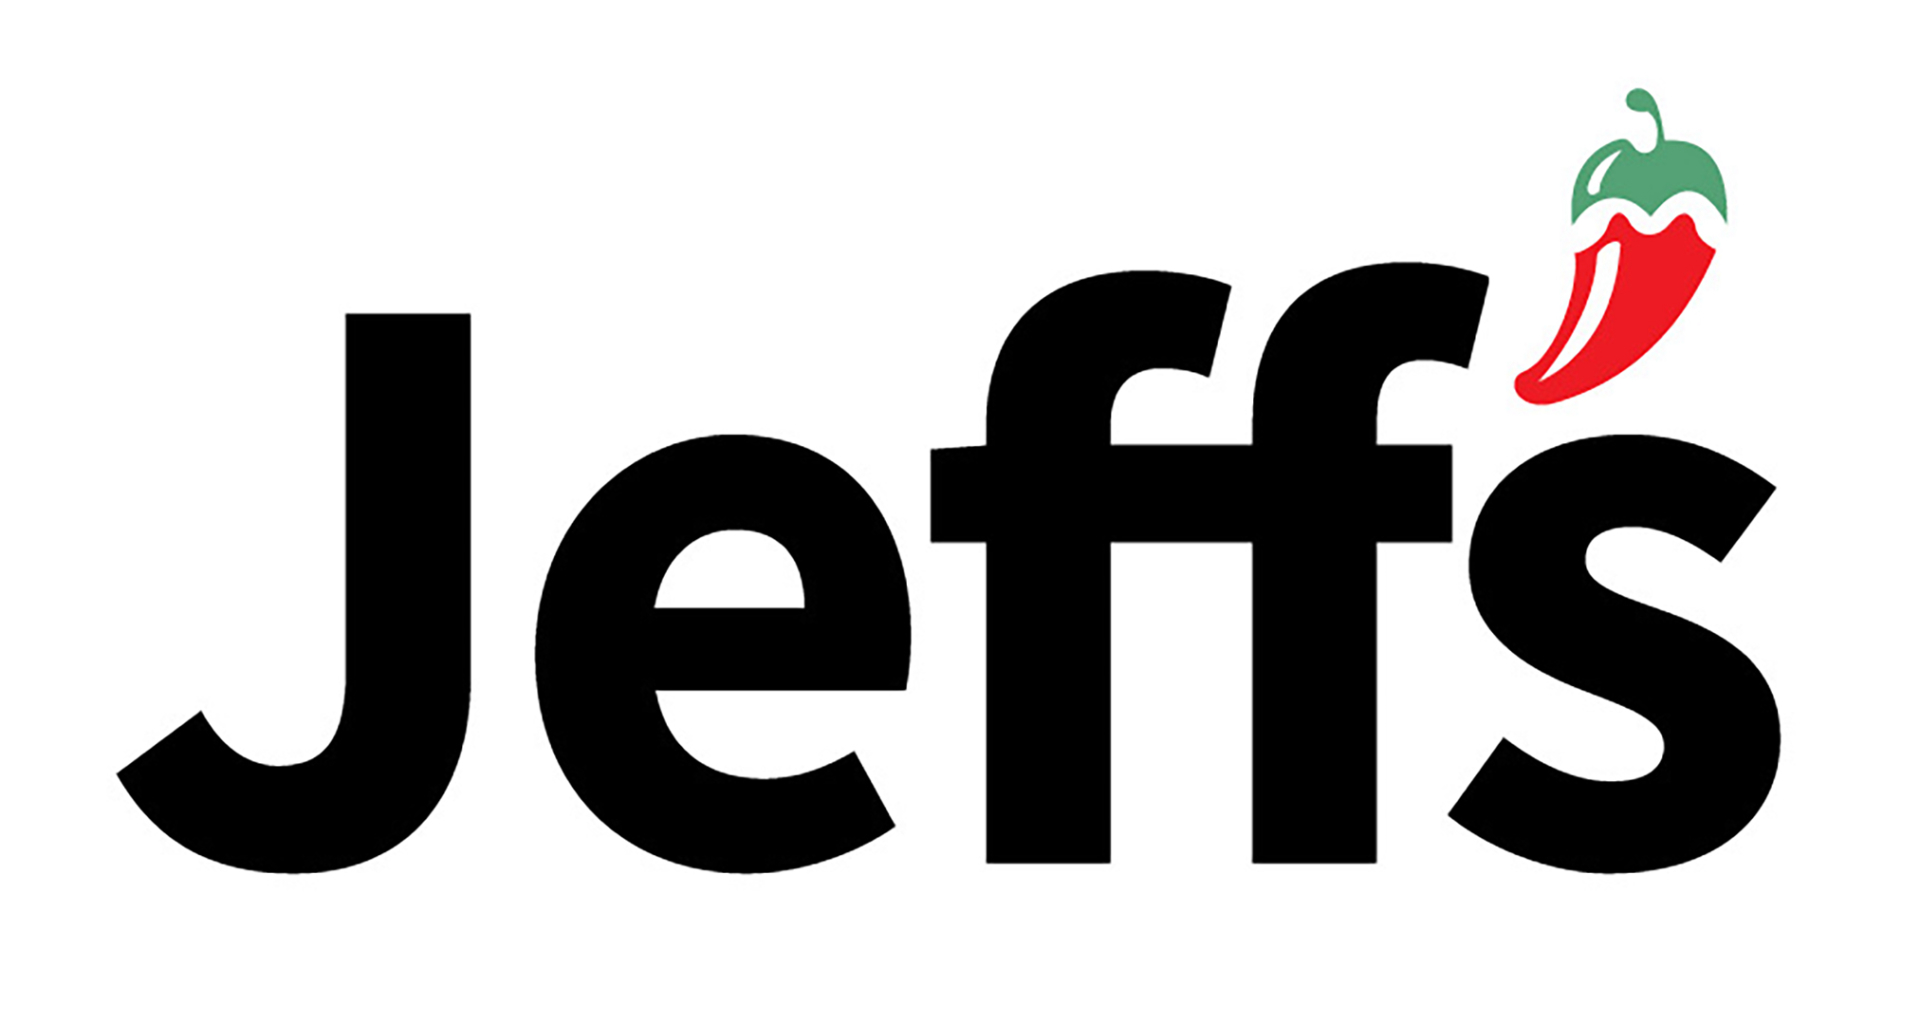 Jeffs